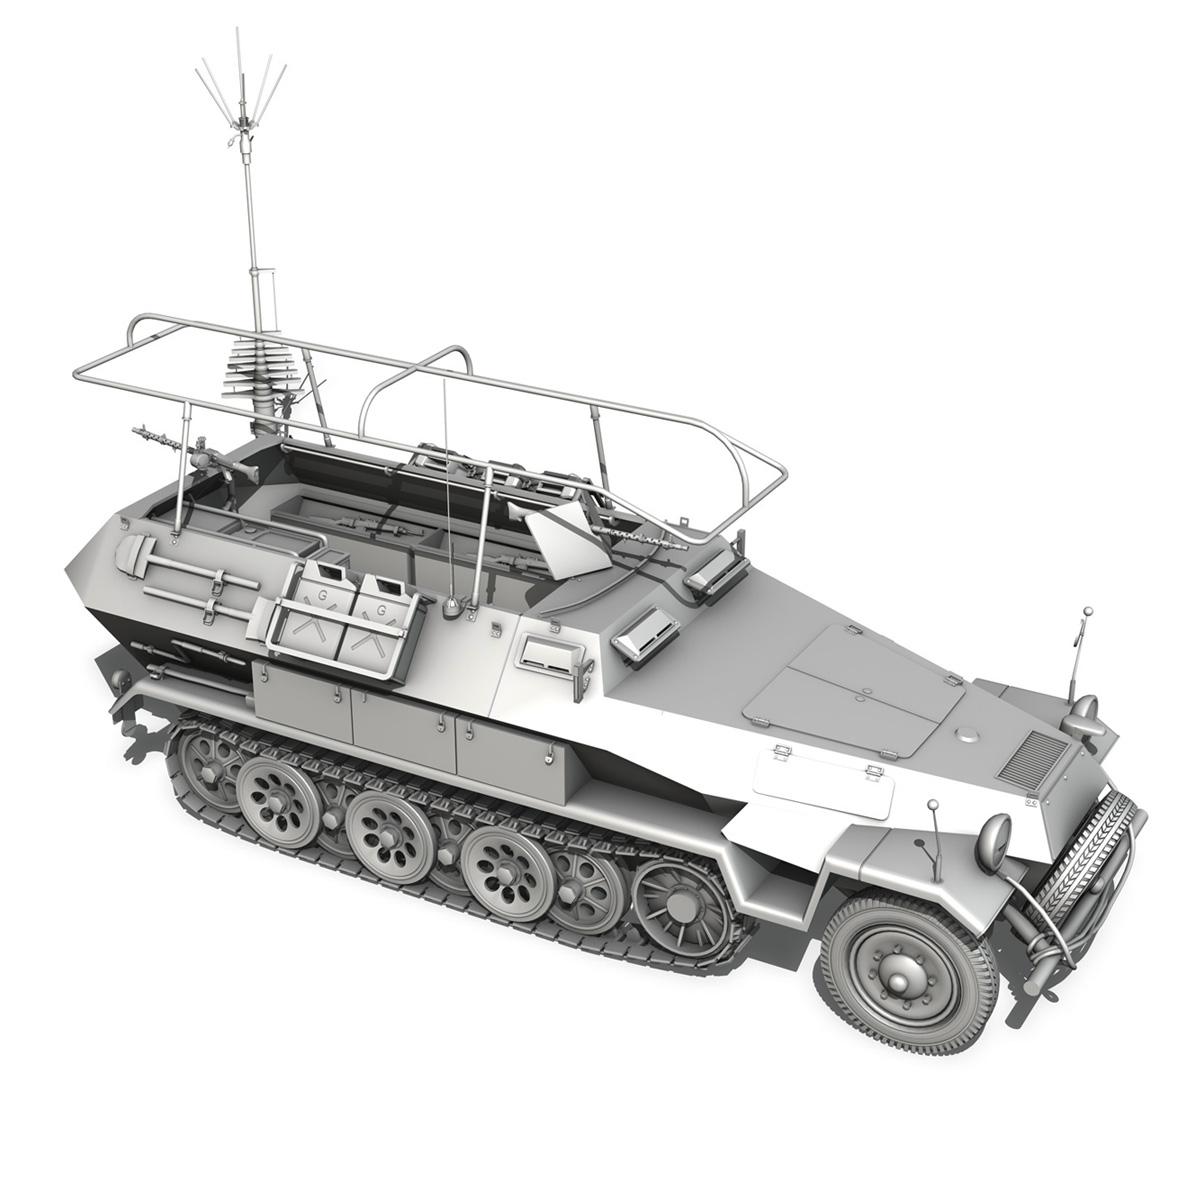 sdkfz 251 ausf.b – communications vehicle 3d model 3ds fbx c4d lwo obj 251698